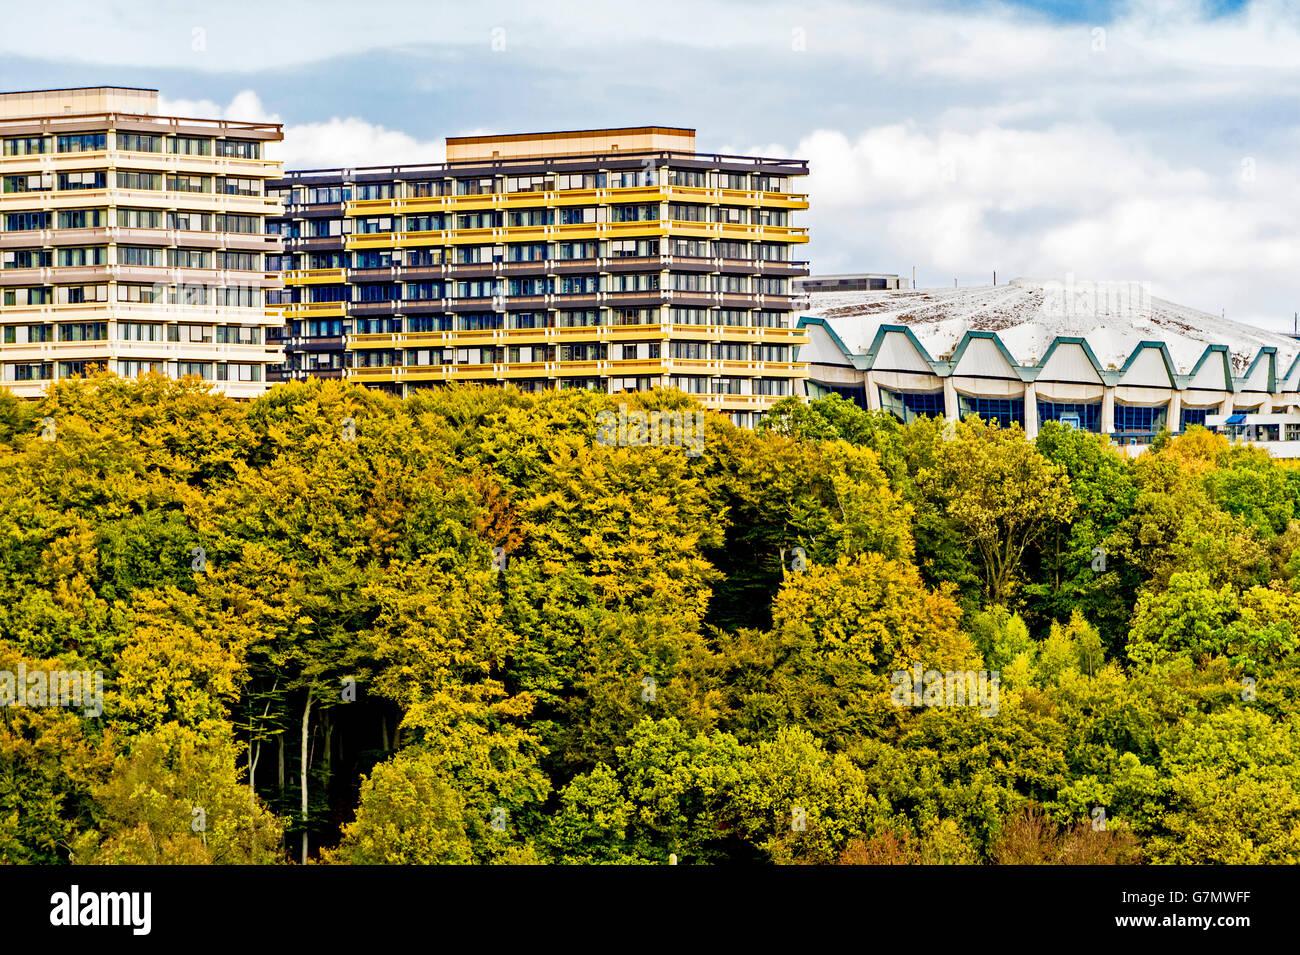 View at the University in Bochum, ruhr area, Germany; Blick auf die Ruhr Universitaet Bochum, vom Süden her - Stock Image